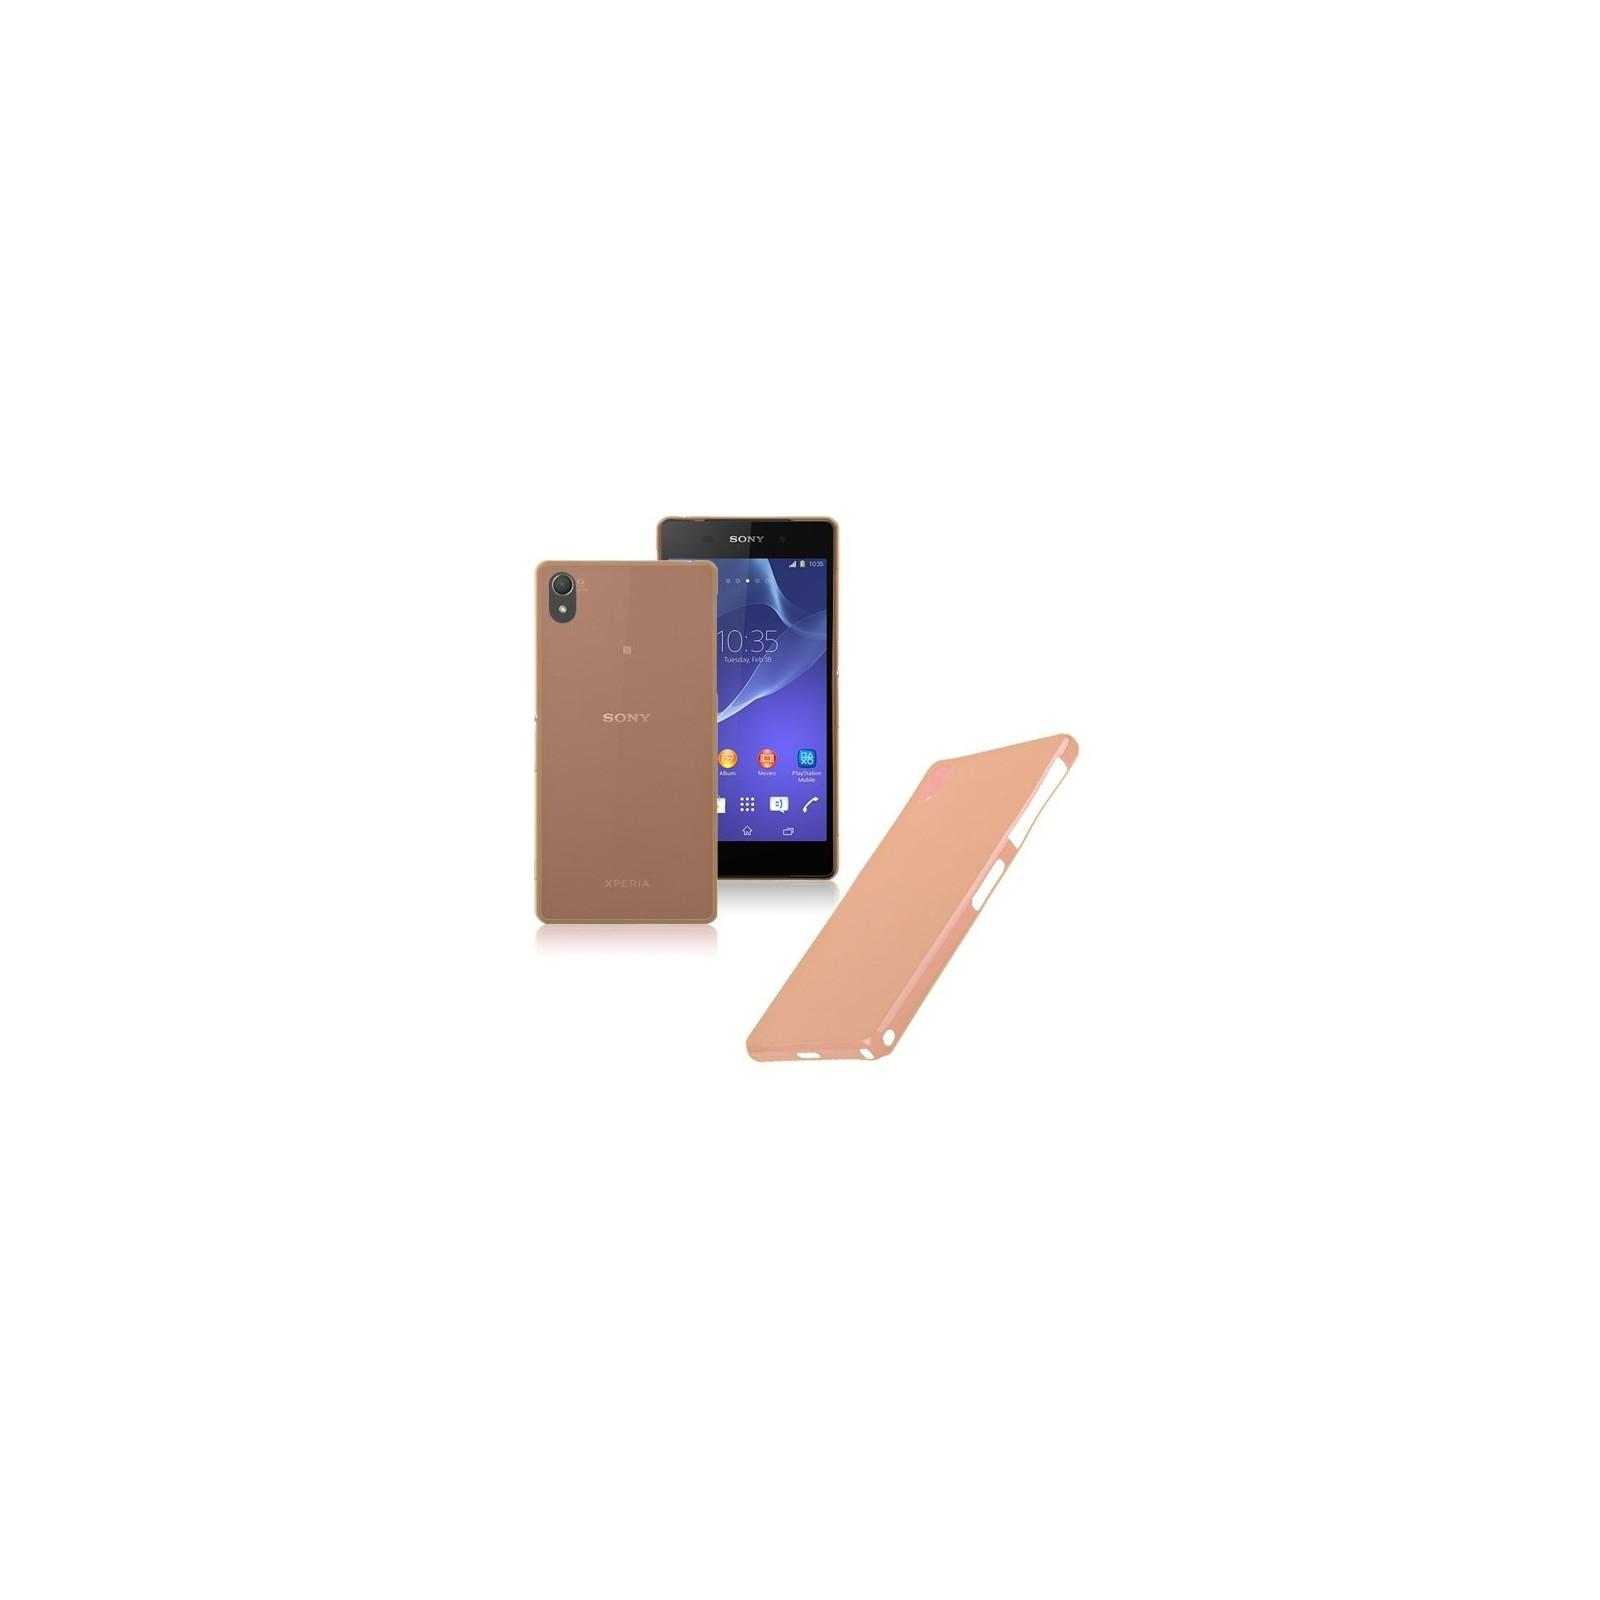 Funda Carcasa TPU ultrafina para Sony Ericsson Xperia Z2 Color Naranja ARREGLATELO - 1